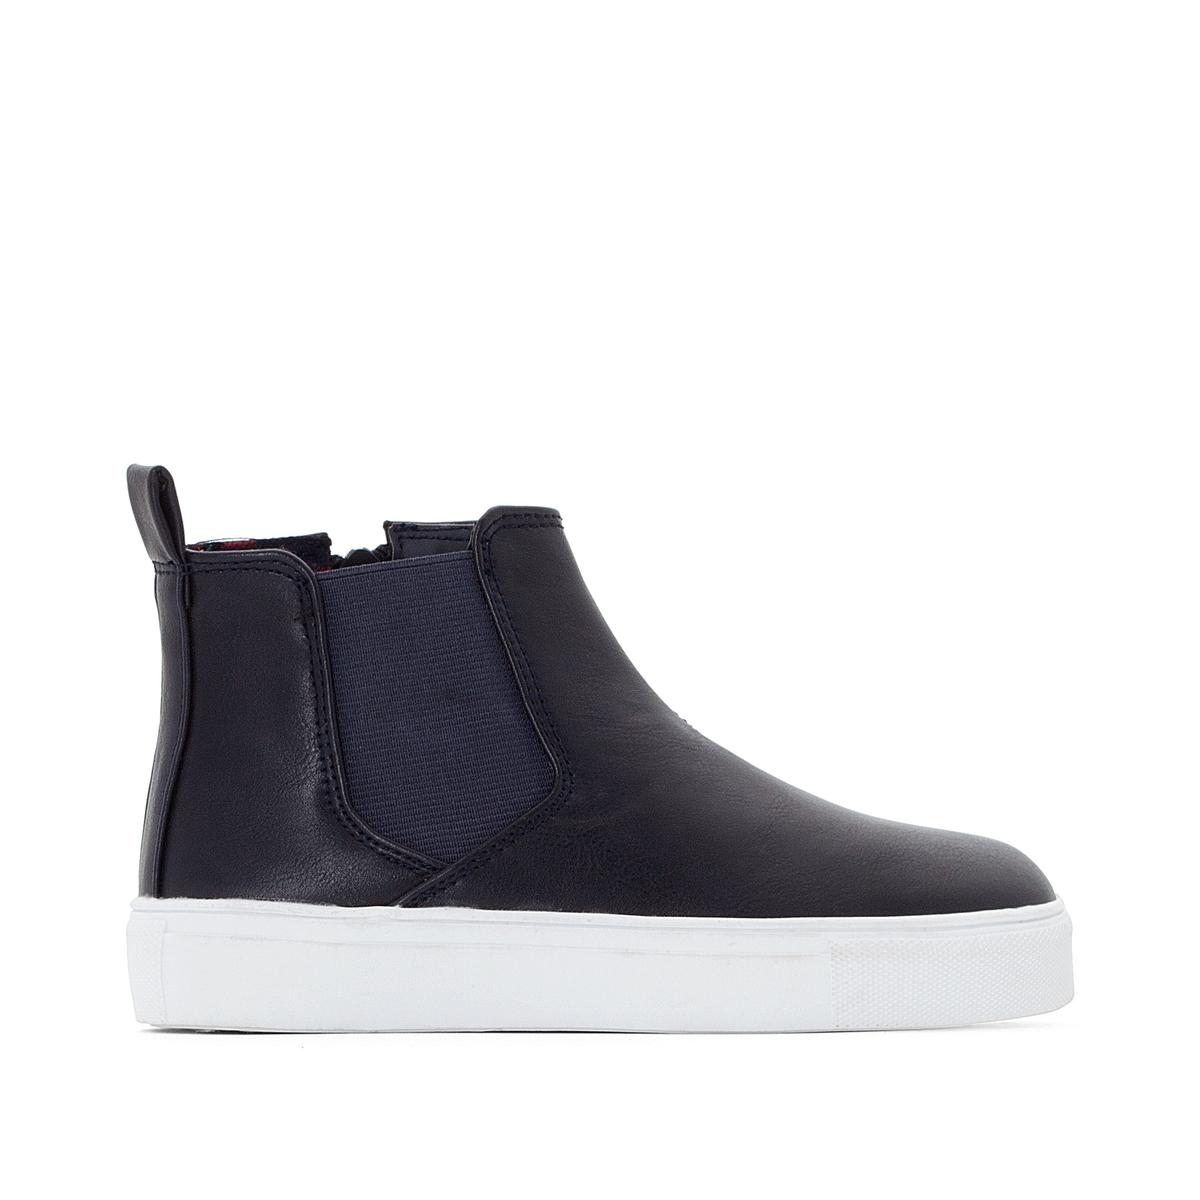 Boots con elastico 26-39